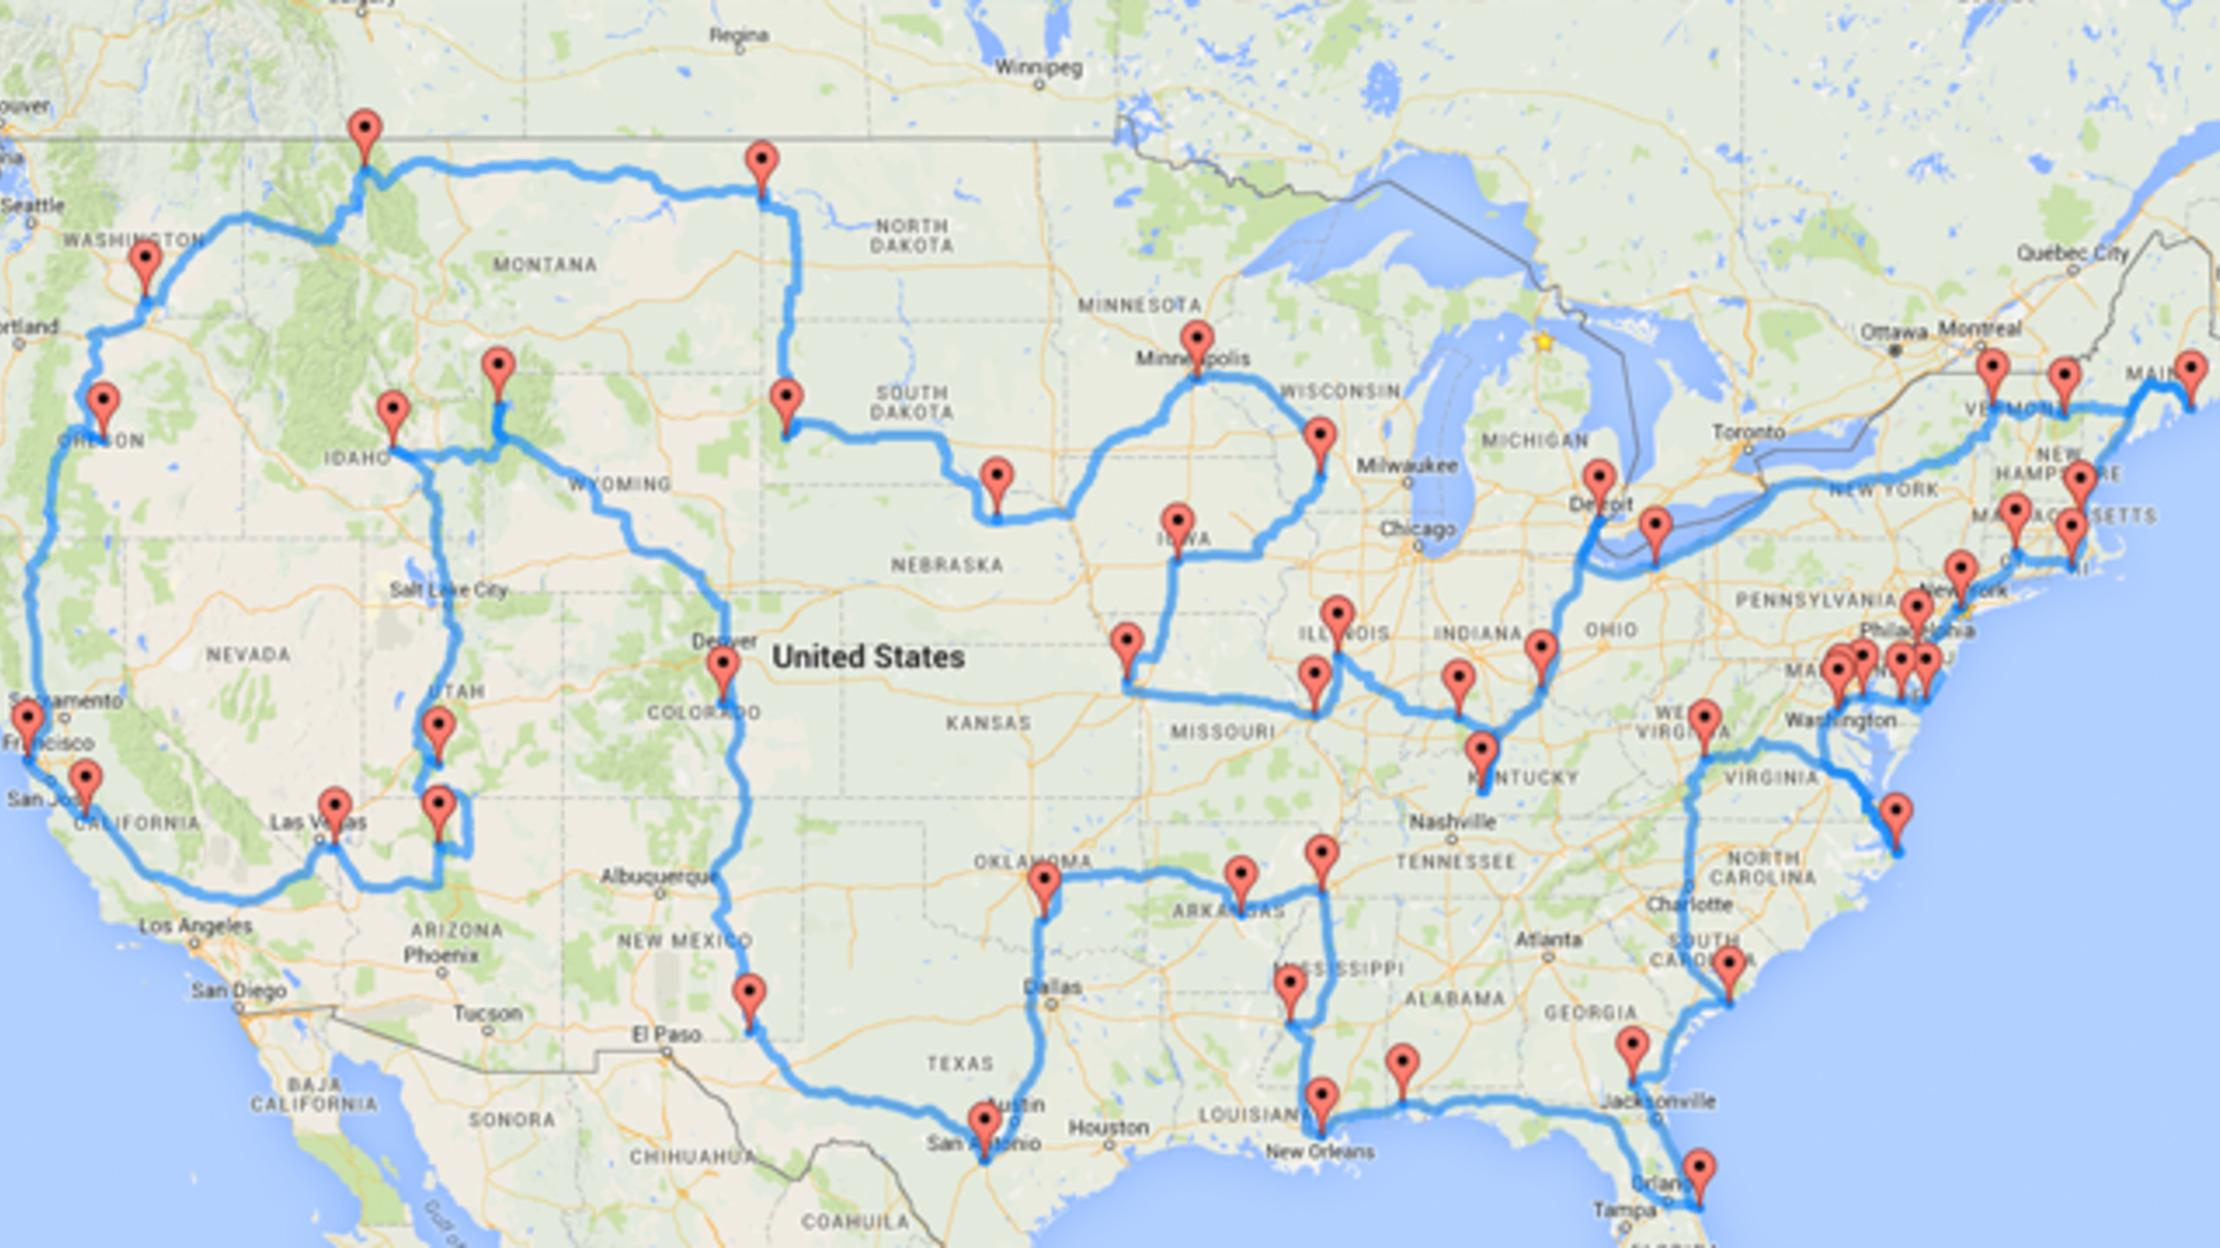 google map usa tour route